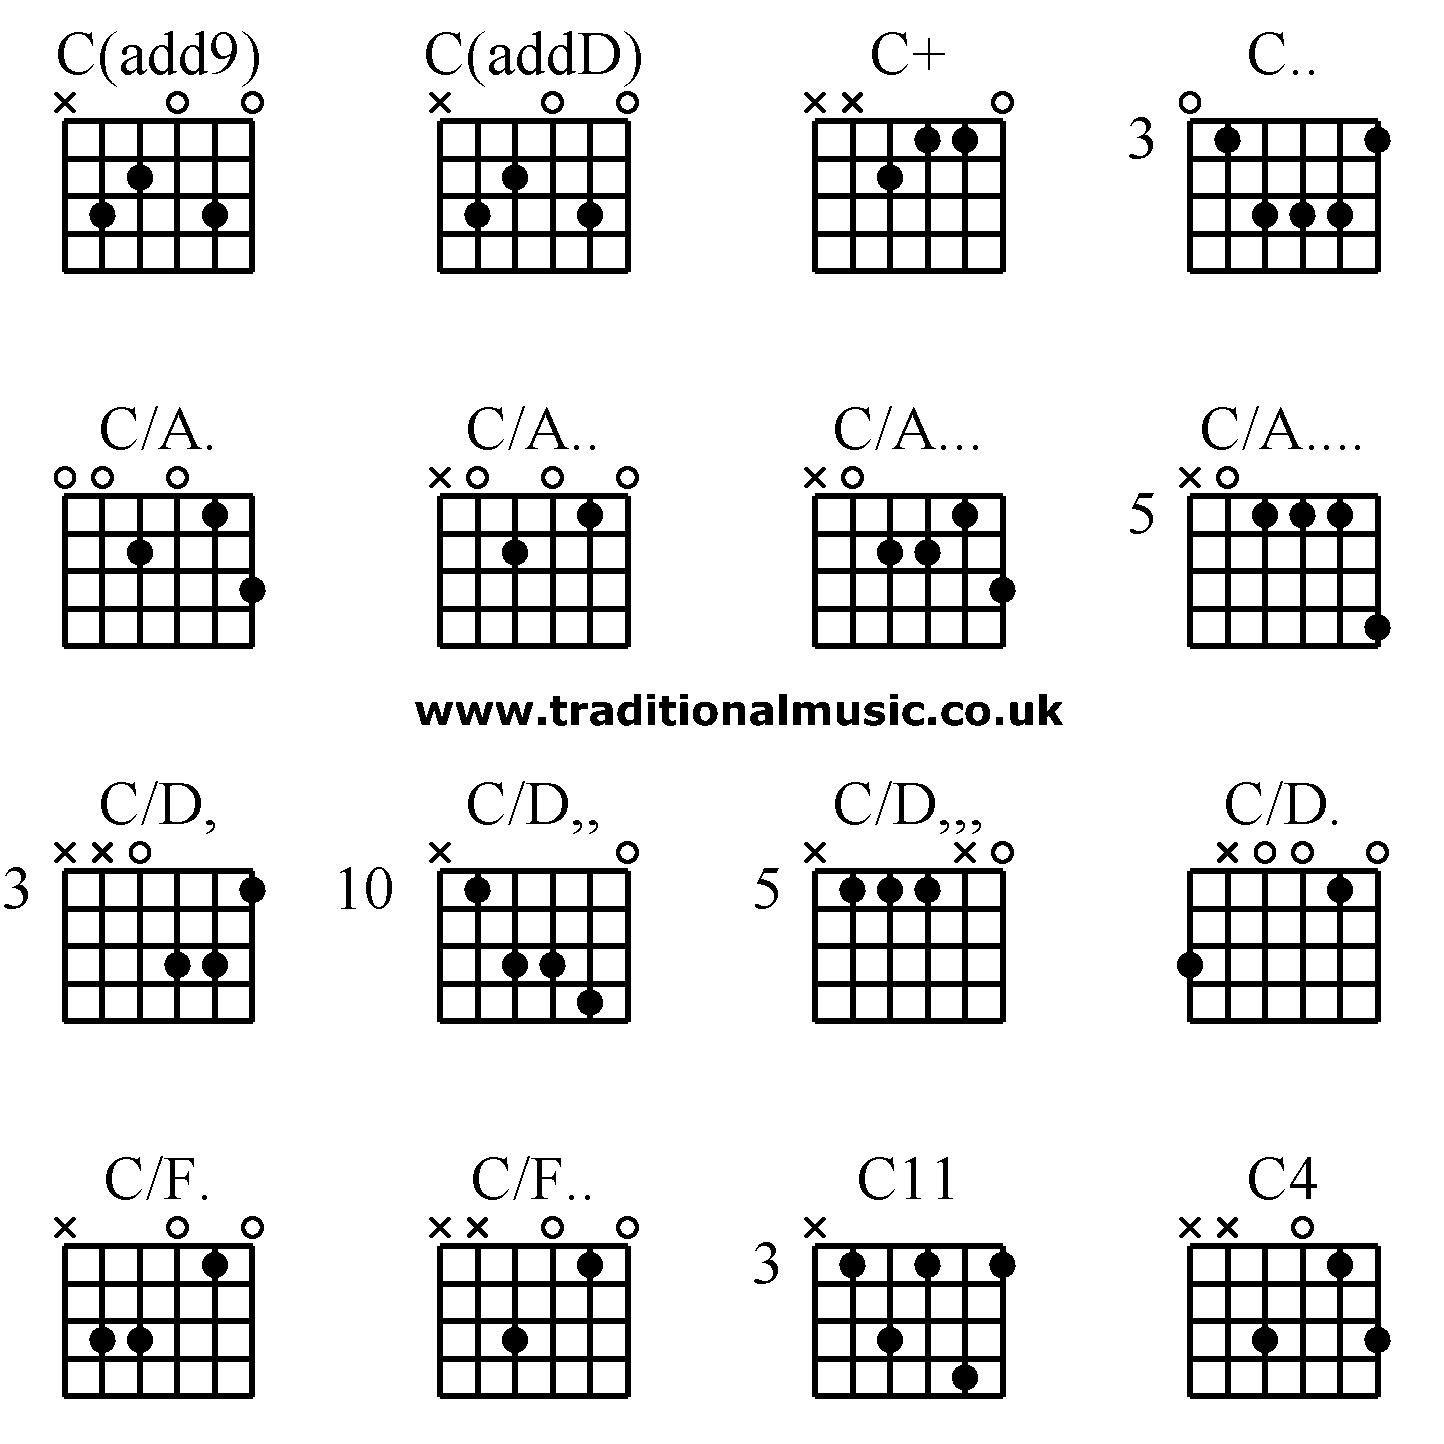 Chords For Guitar Guitar Chords Advanced Cadd9 Caddd C C Ca Ca Ca Ca